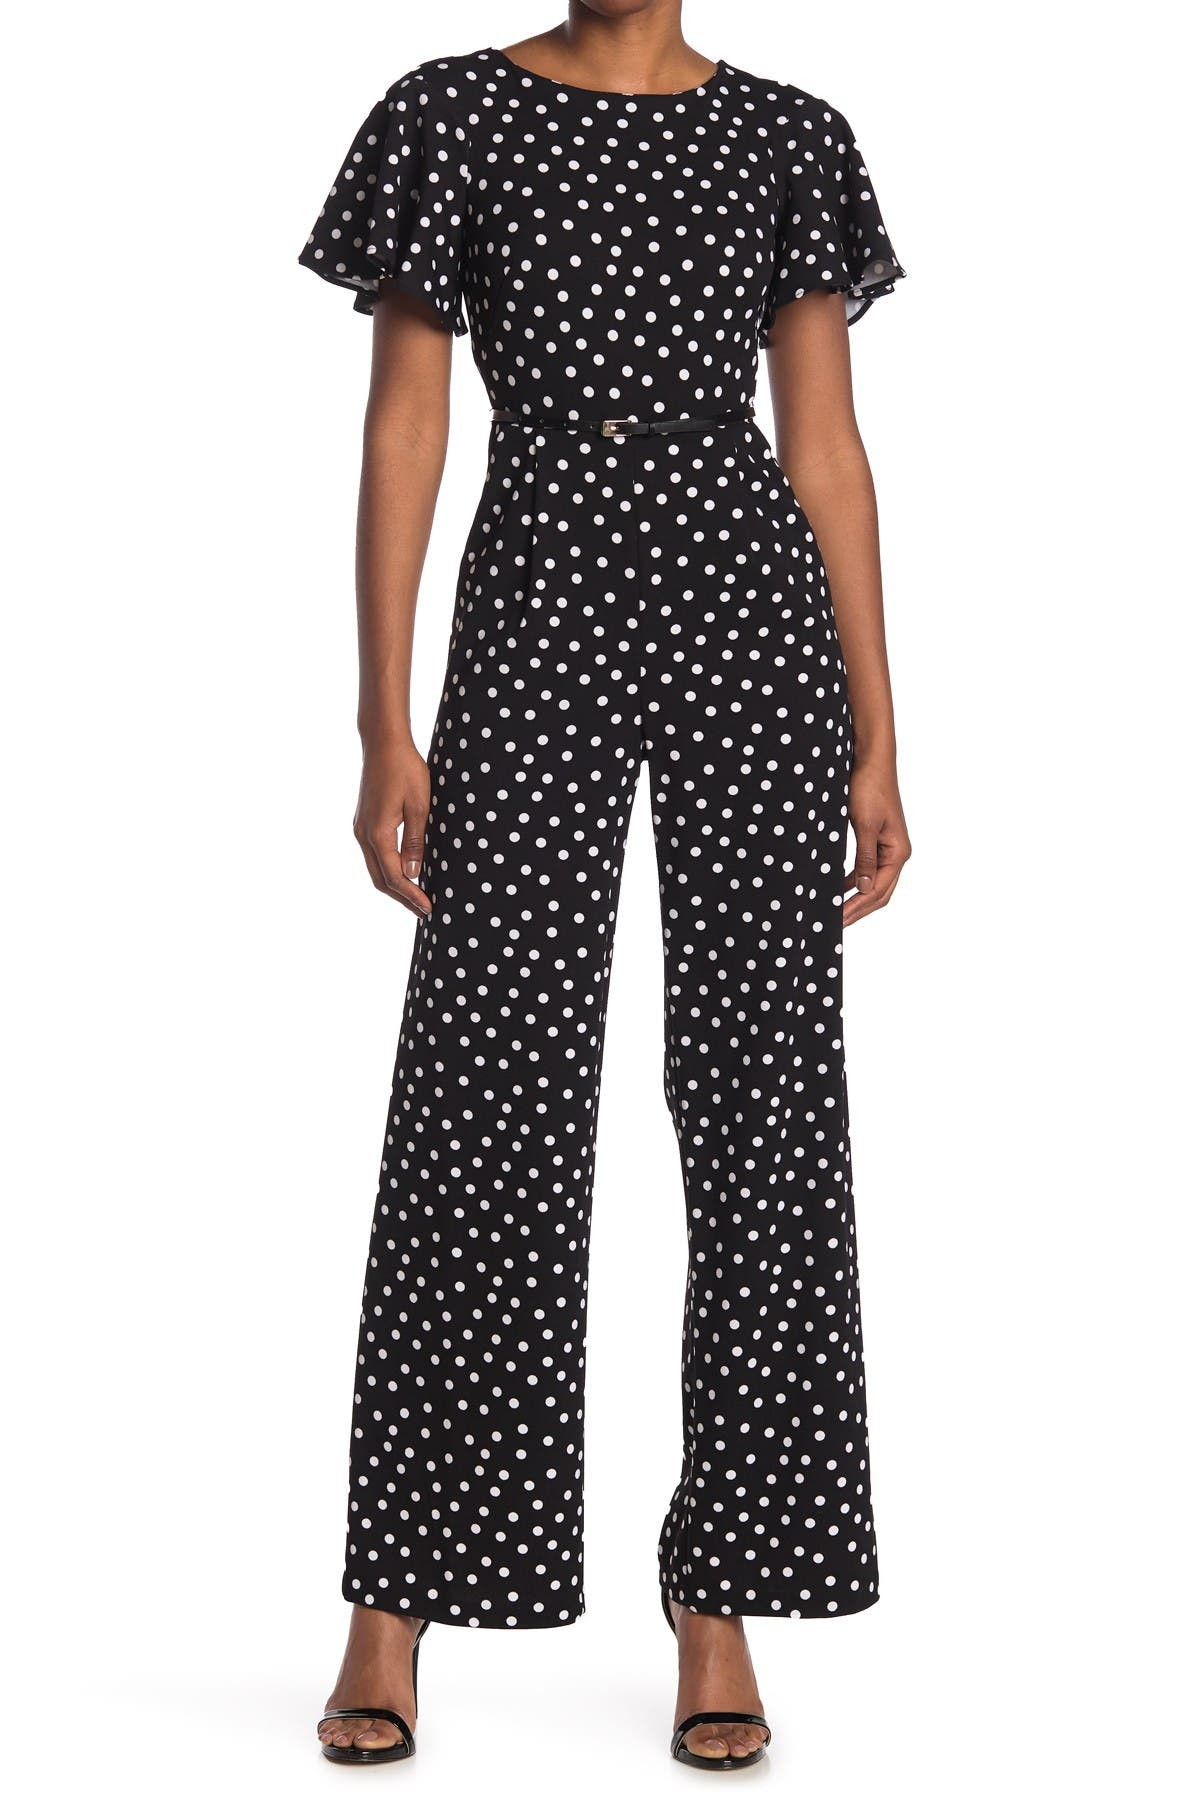 Image of Calvin Klein Flutter Short Sleeve Dash Print Jumpsuit